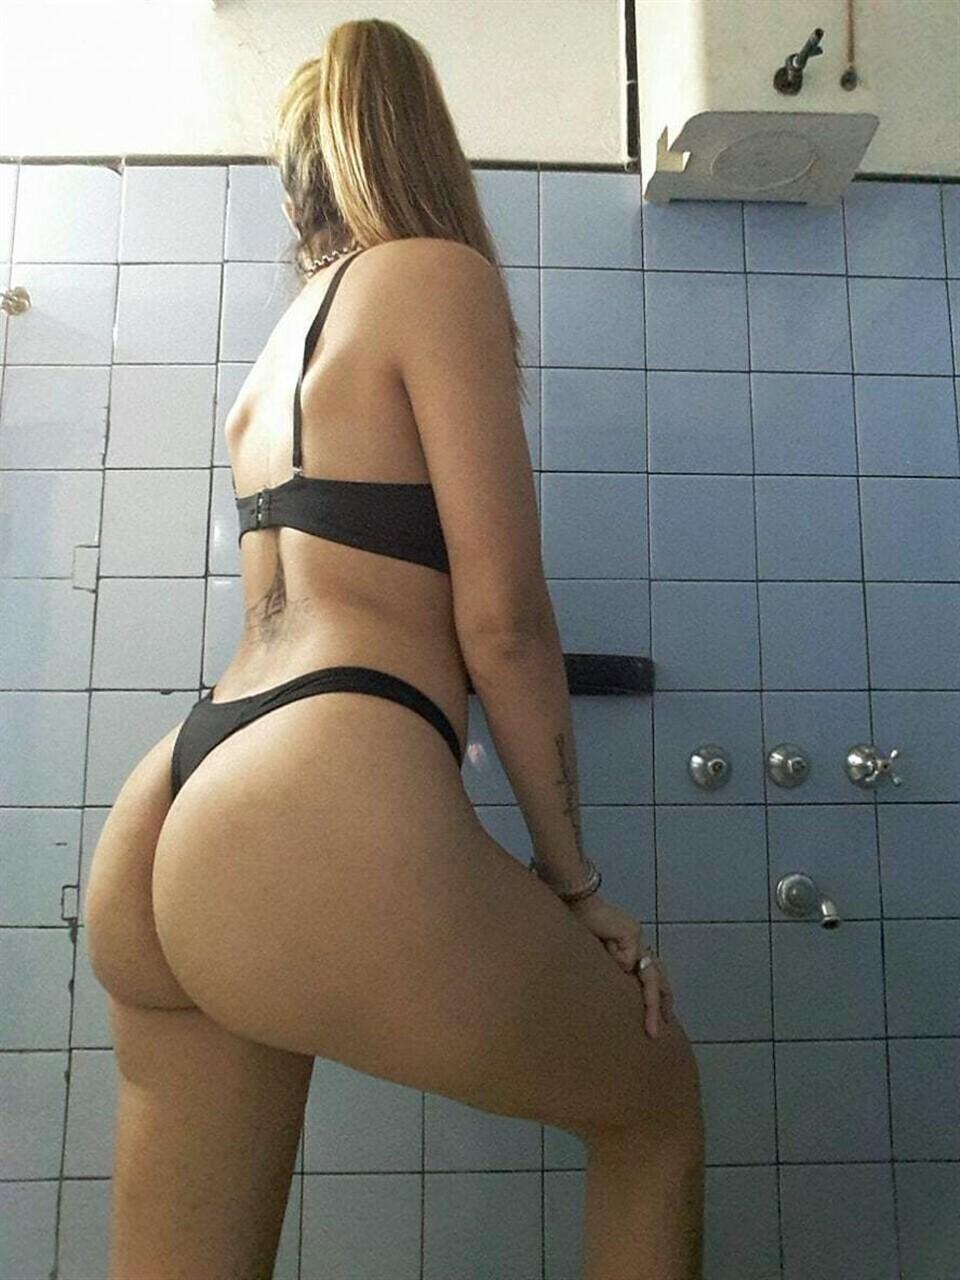 fotos esposas amateurs calientes imagenes de porno casero